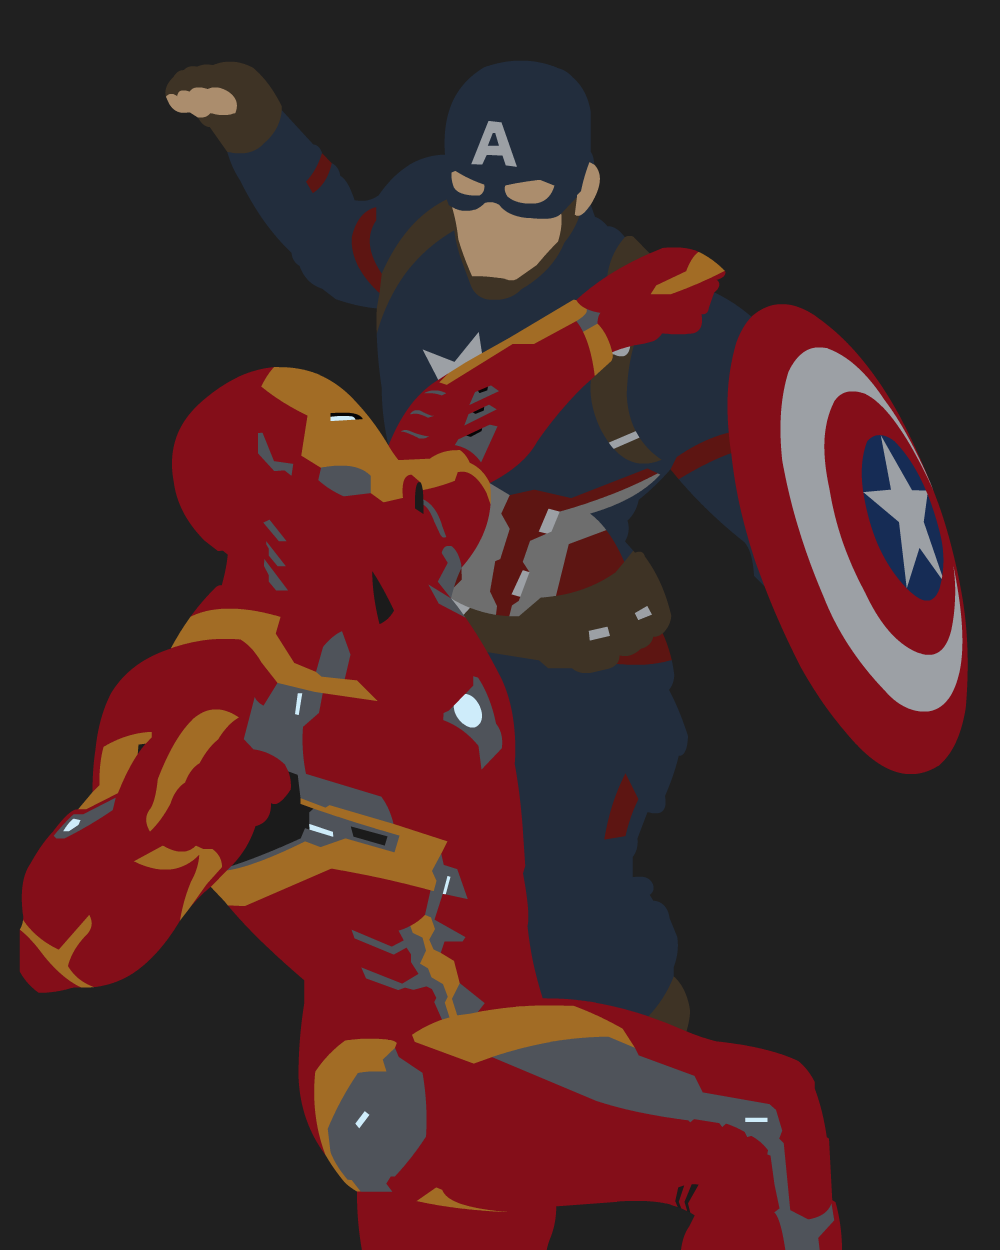 Iron-Man vs Captain America 1 by dragonitearmy on DeviantArt